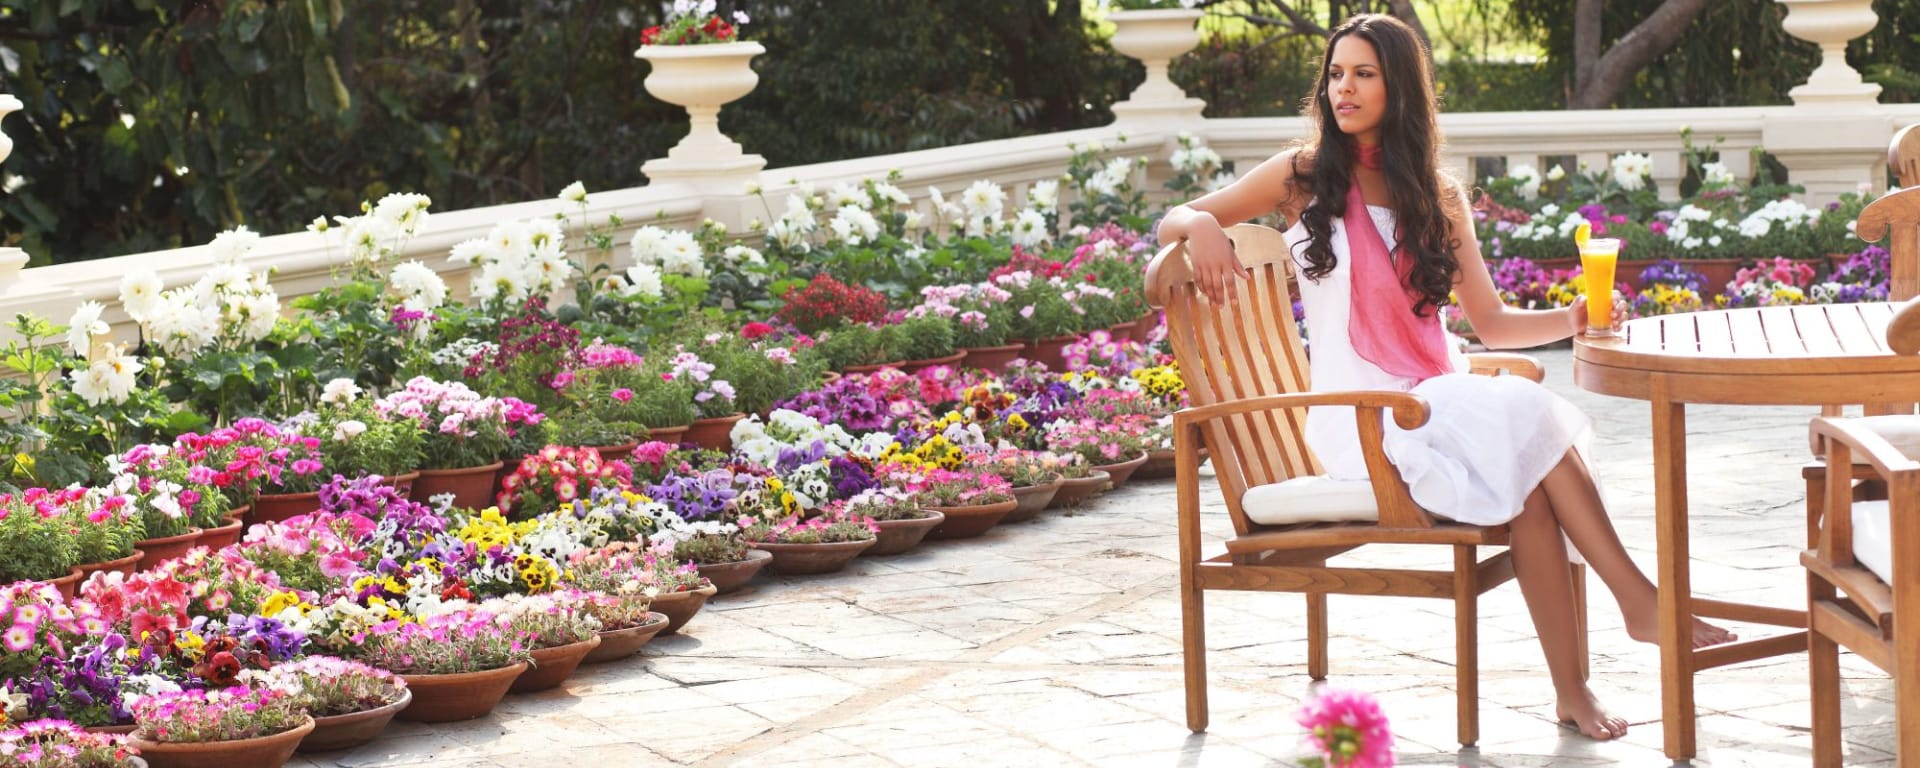 Ananda In The Himalayas in Rishikesh: Flower Gardens at Ananda